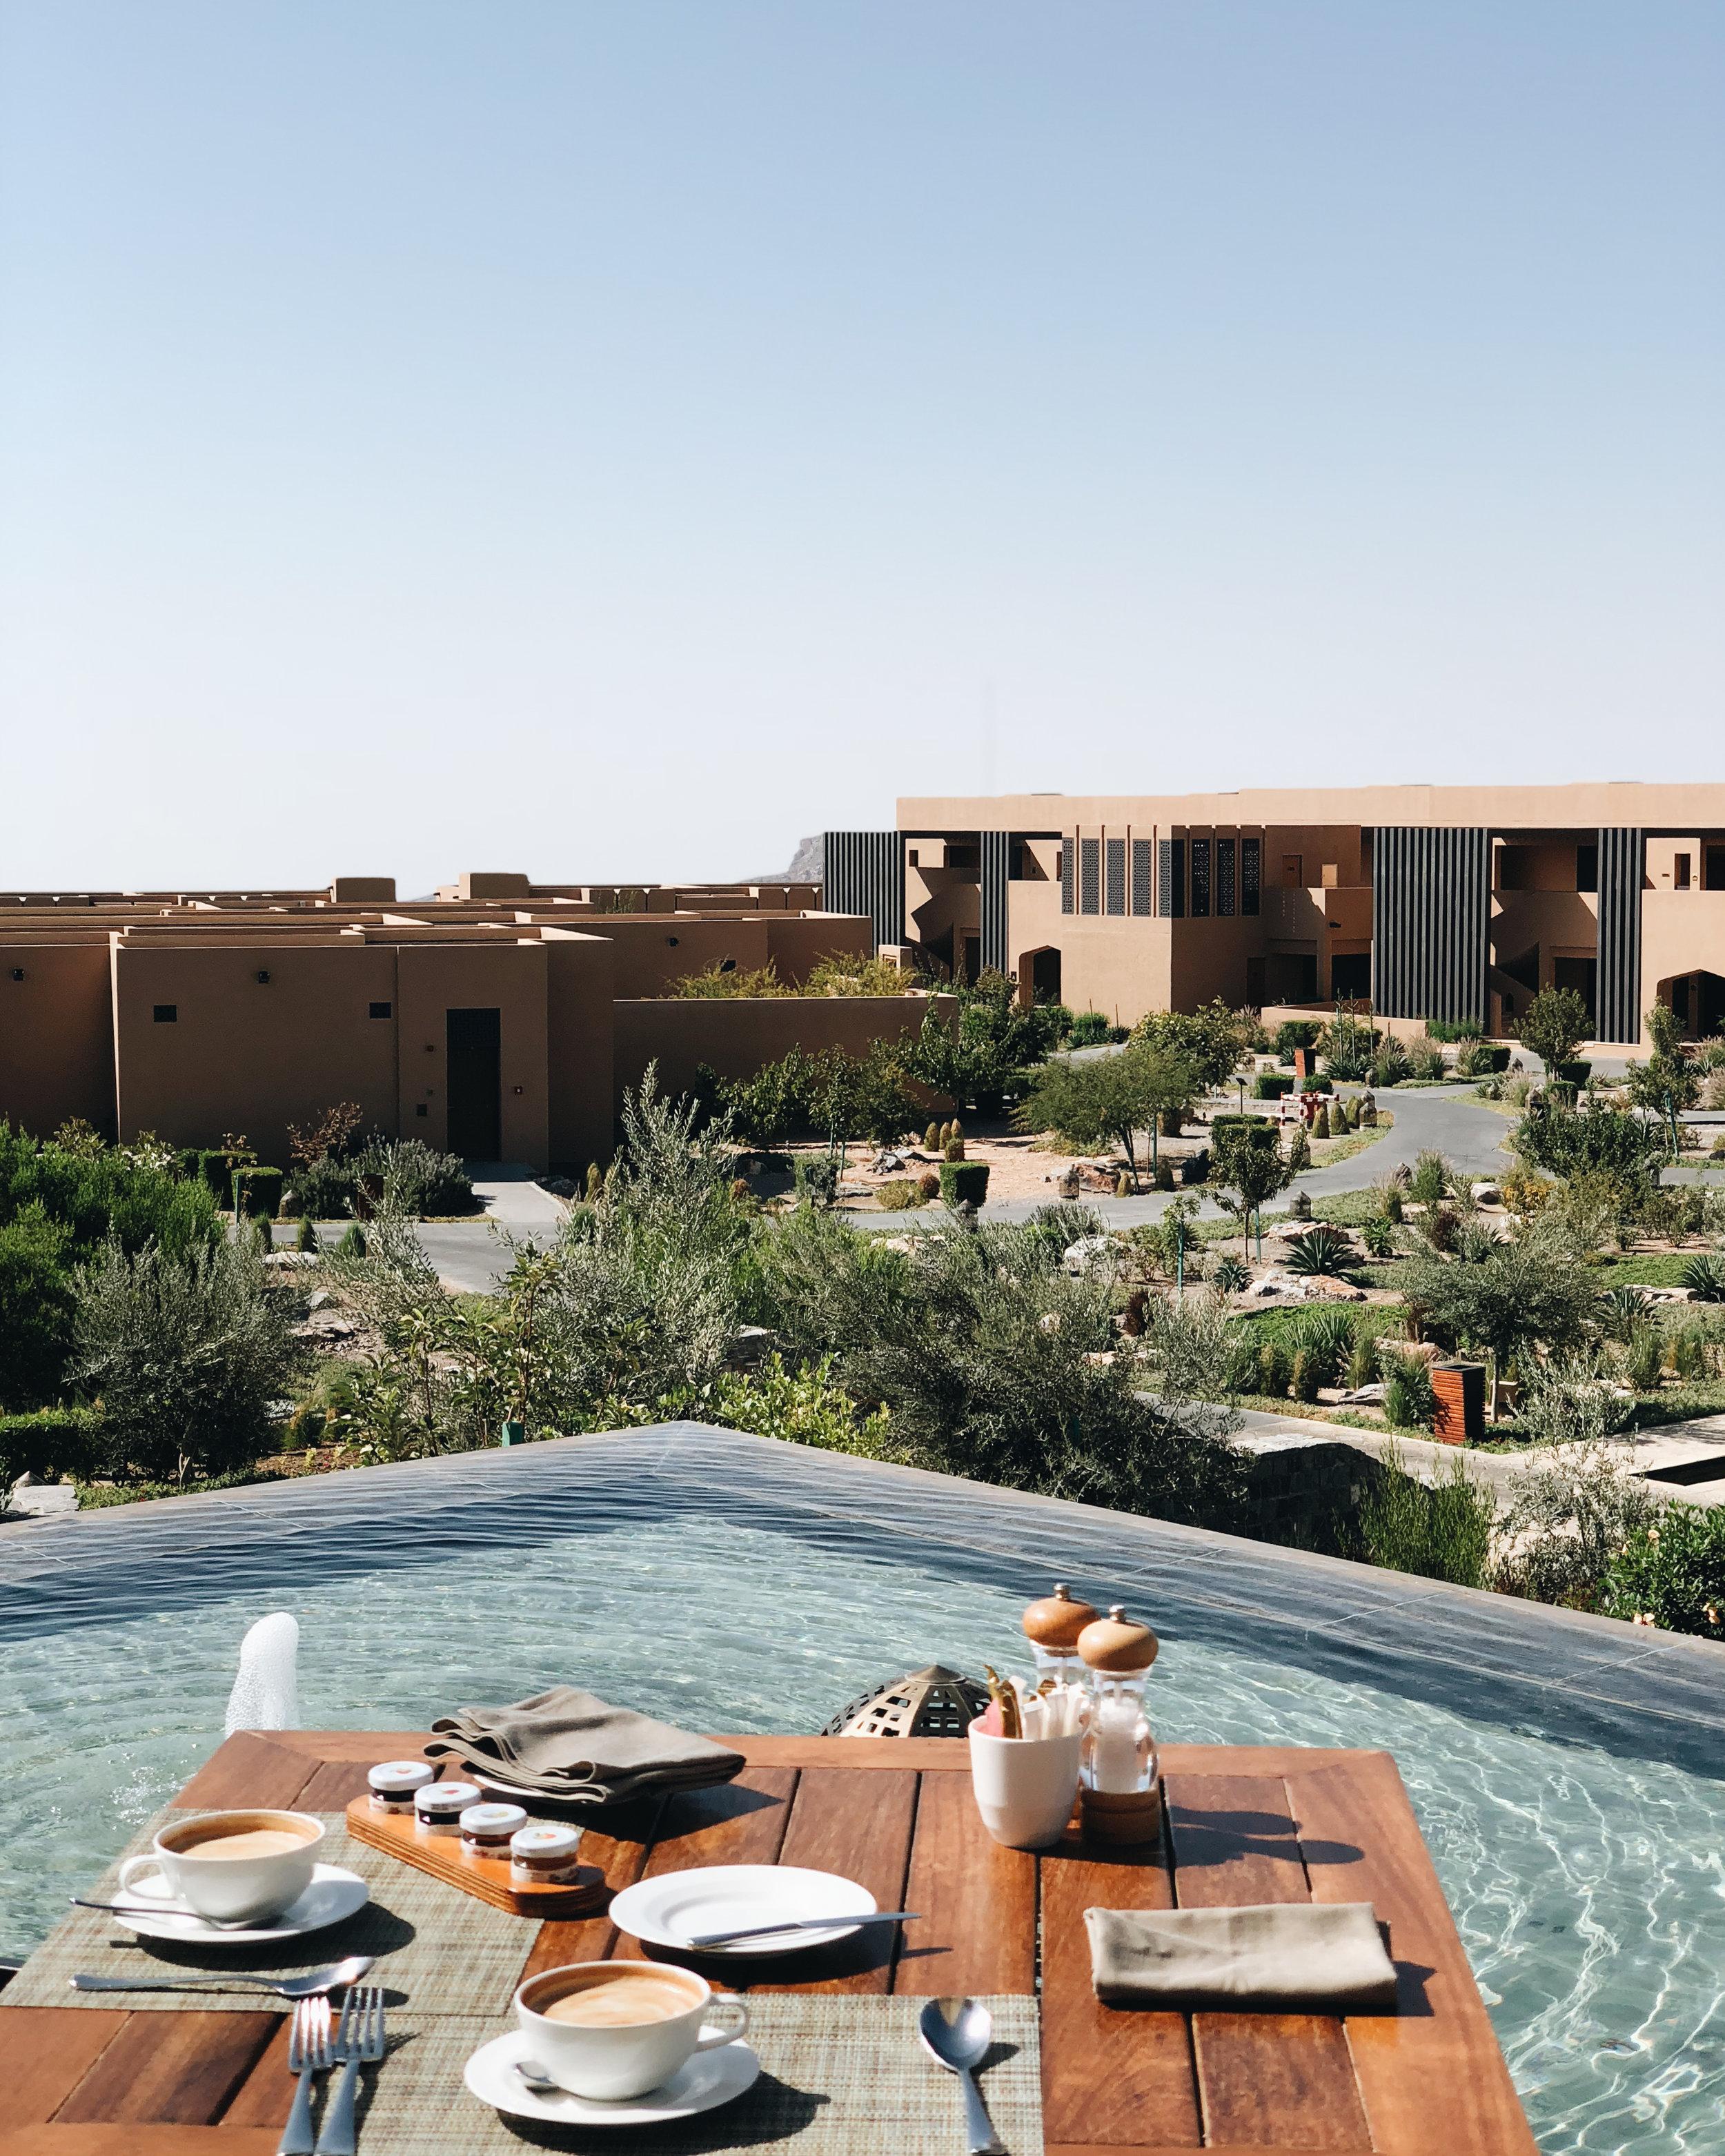 Oman-5032.jpg